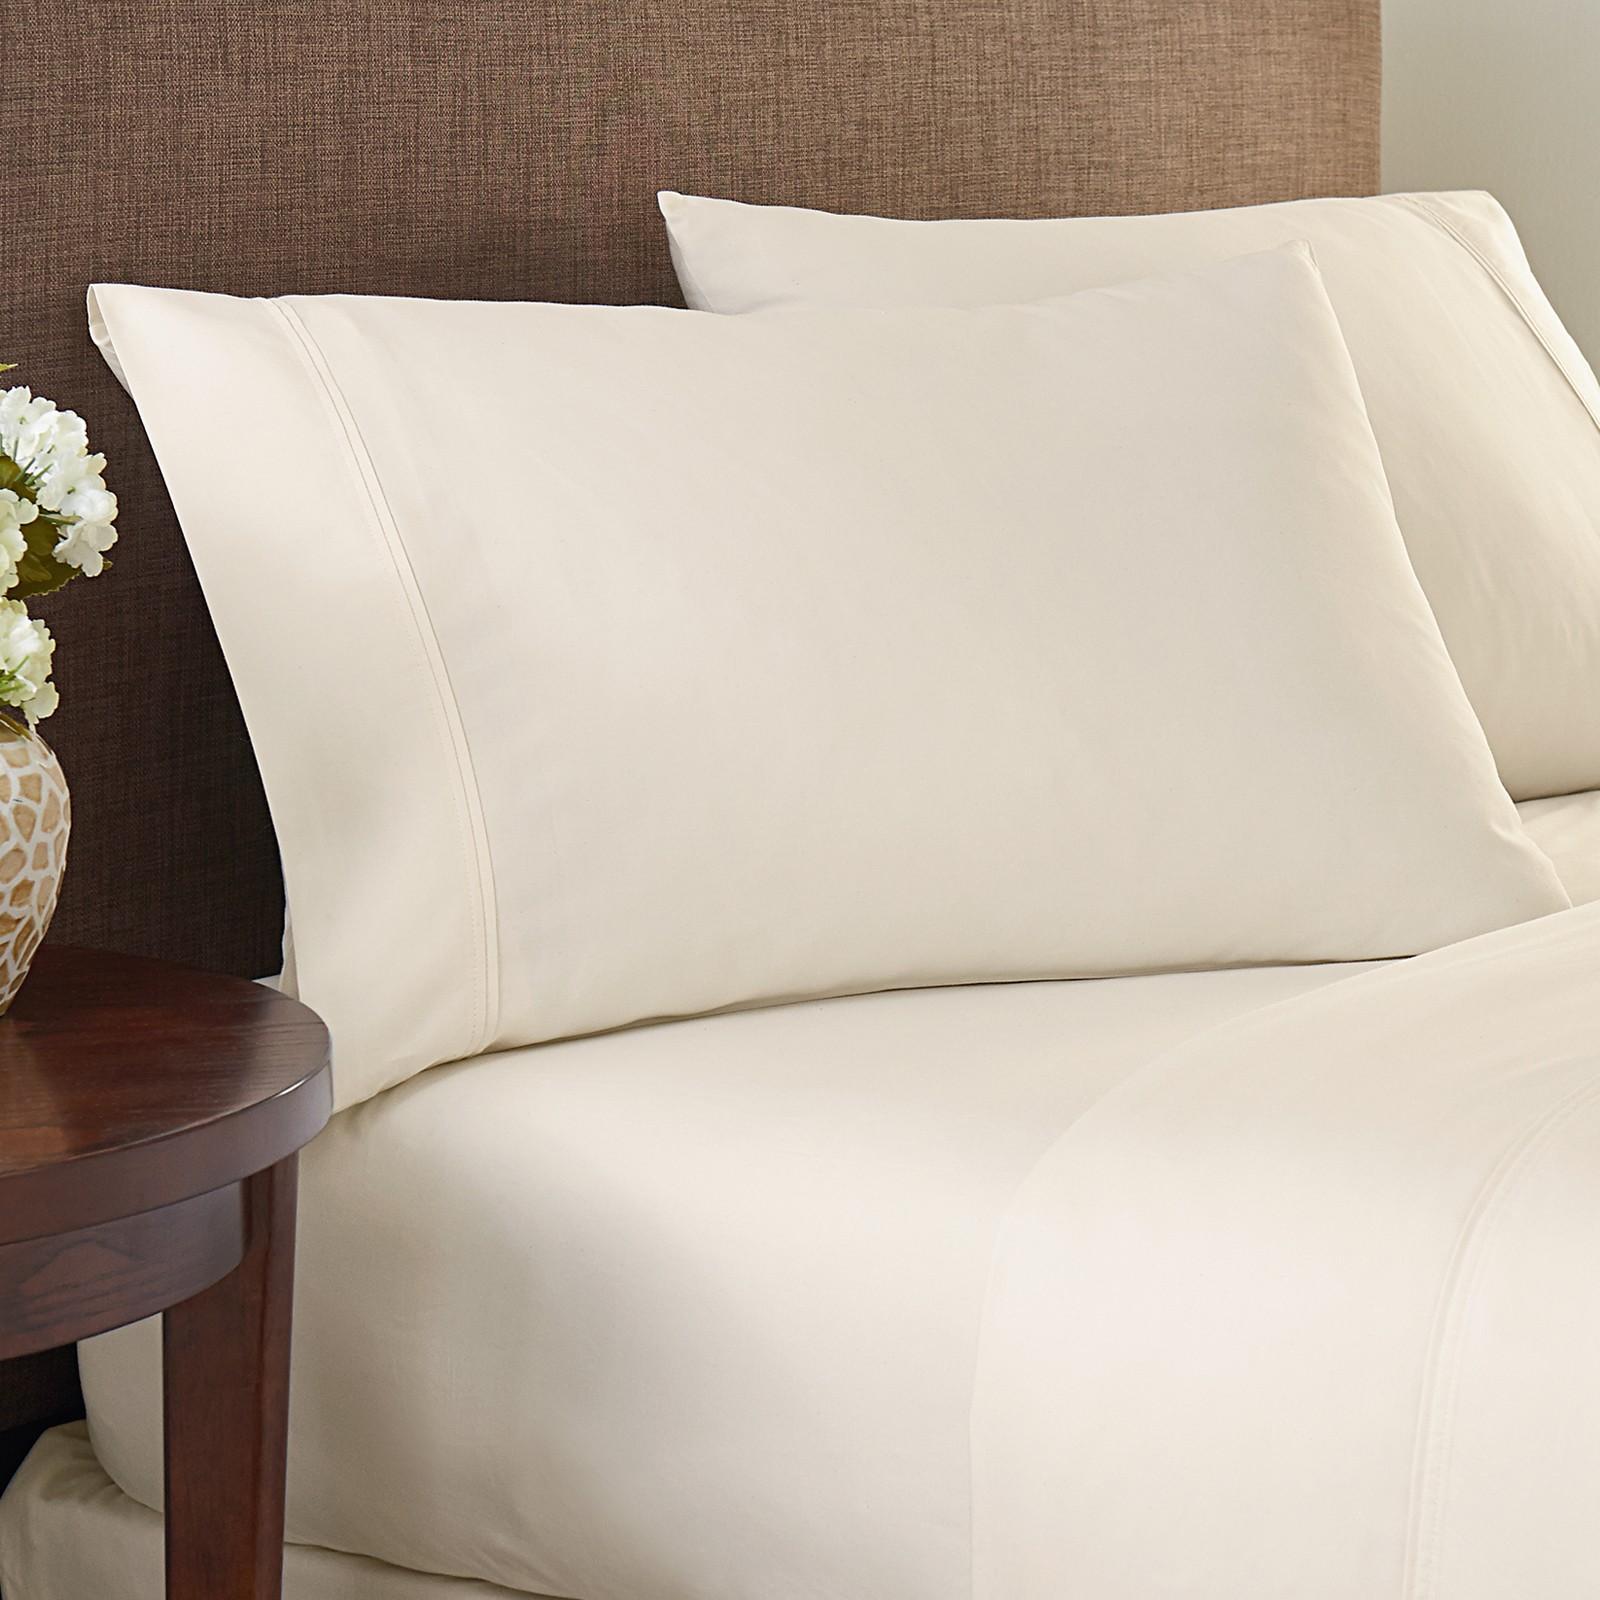 Amaze by welspun cotton sheet set bedding king navy blue - Amaze By Welspun Cotton Sheet Set Bedding King Navy Blue 6